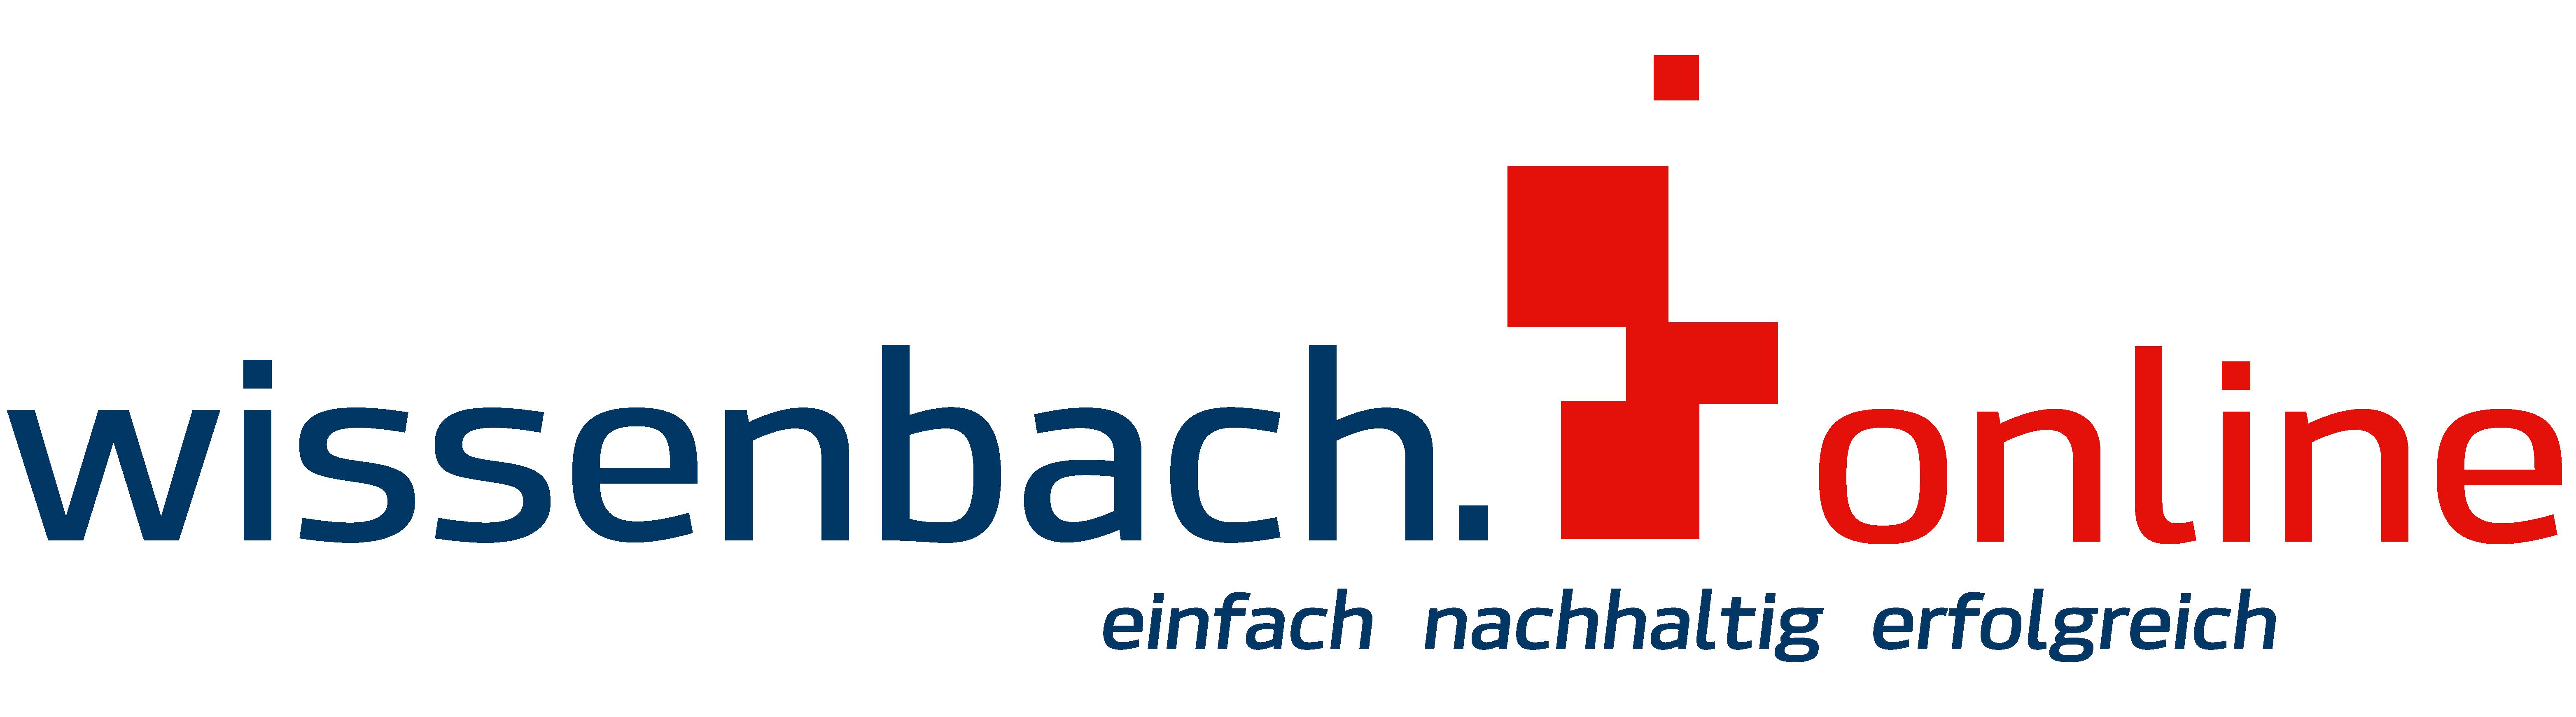 wissenbach-online.de